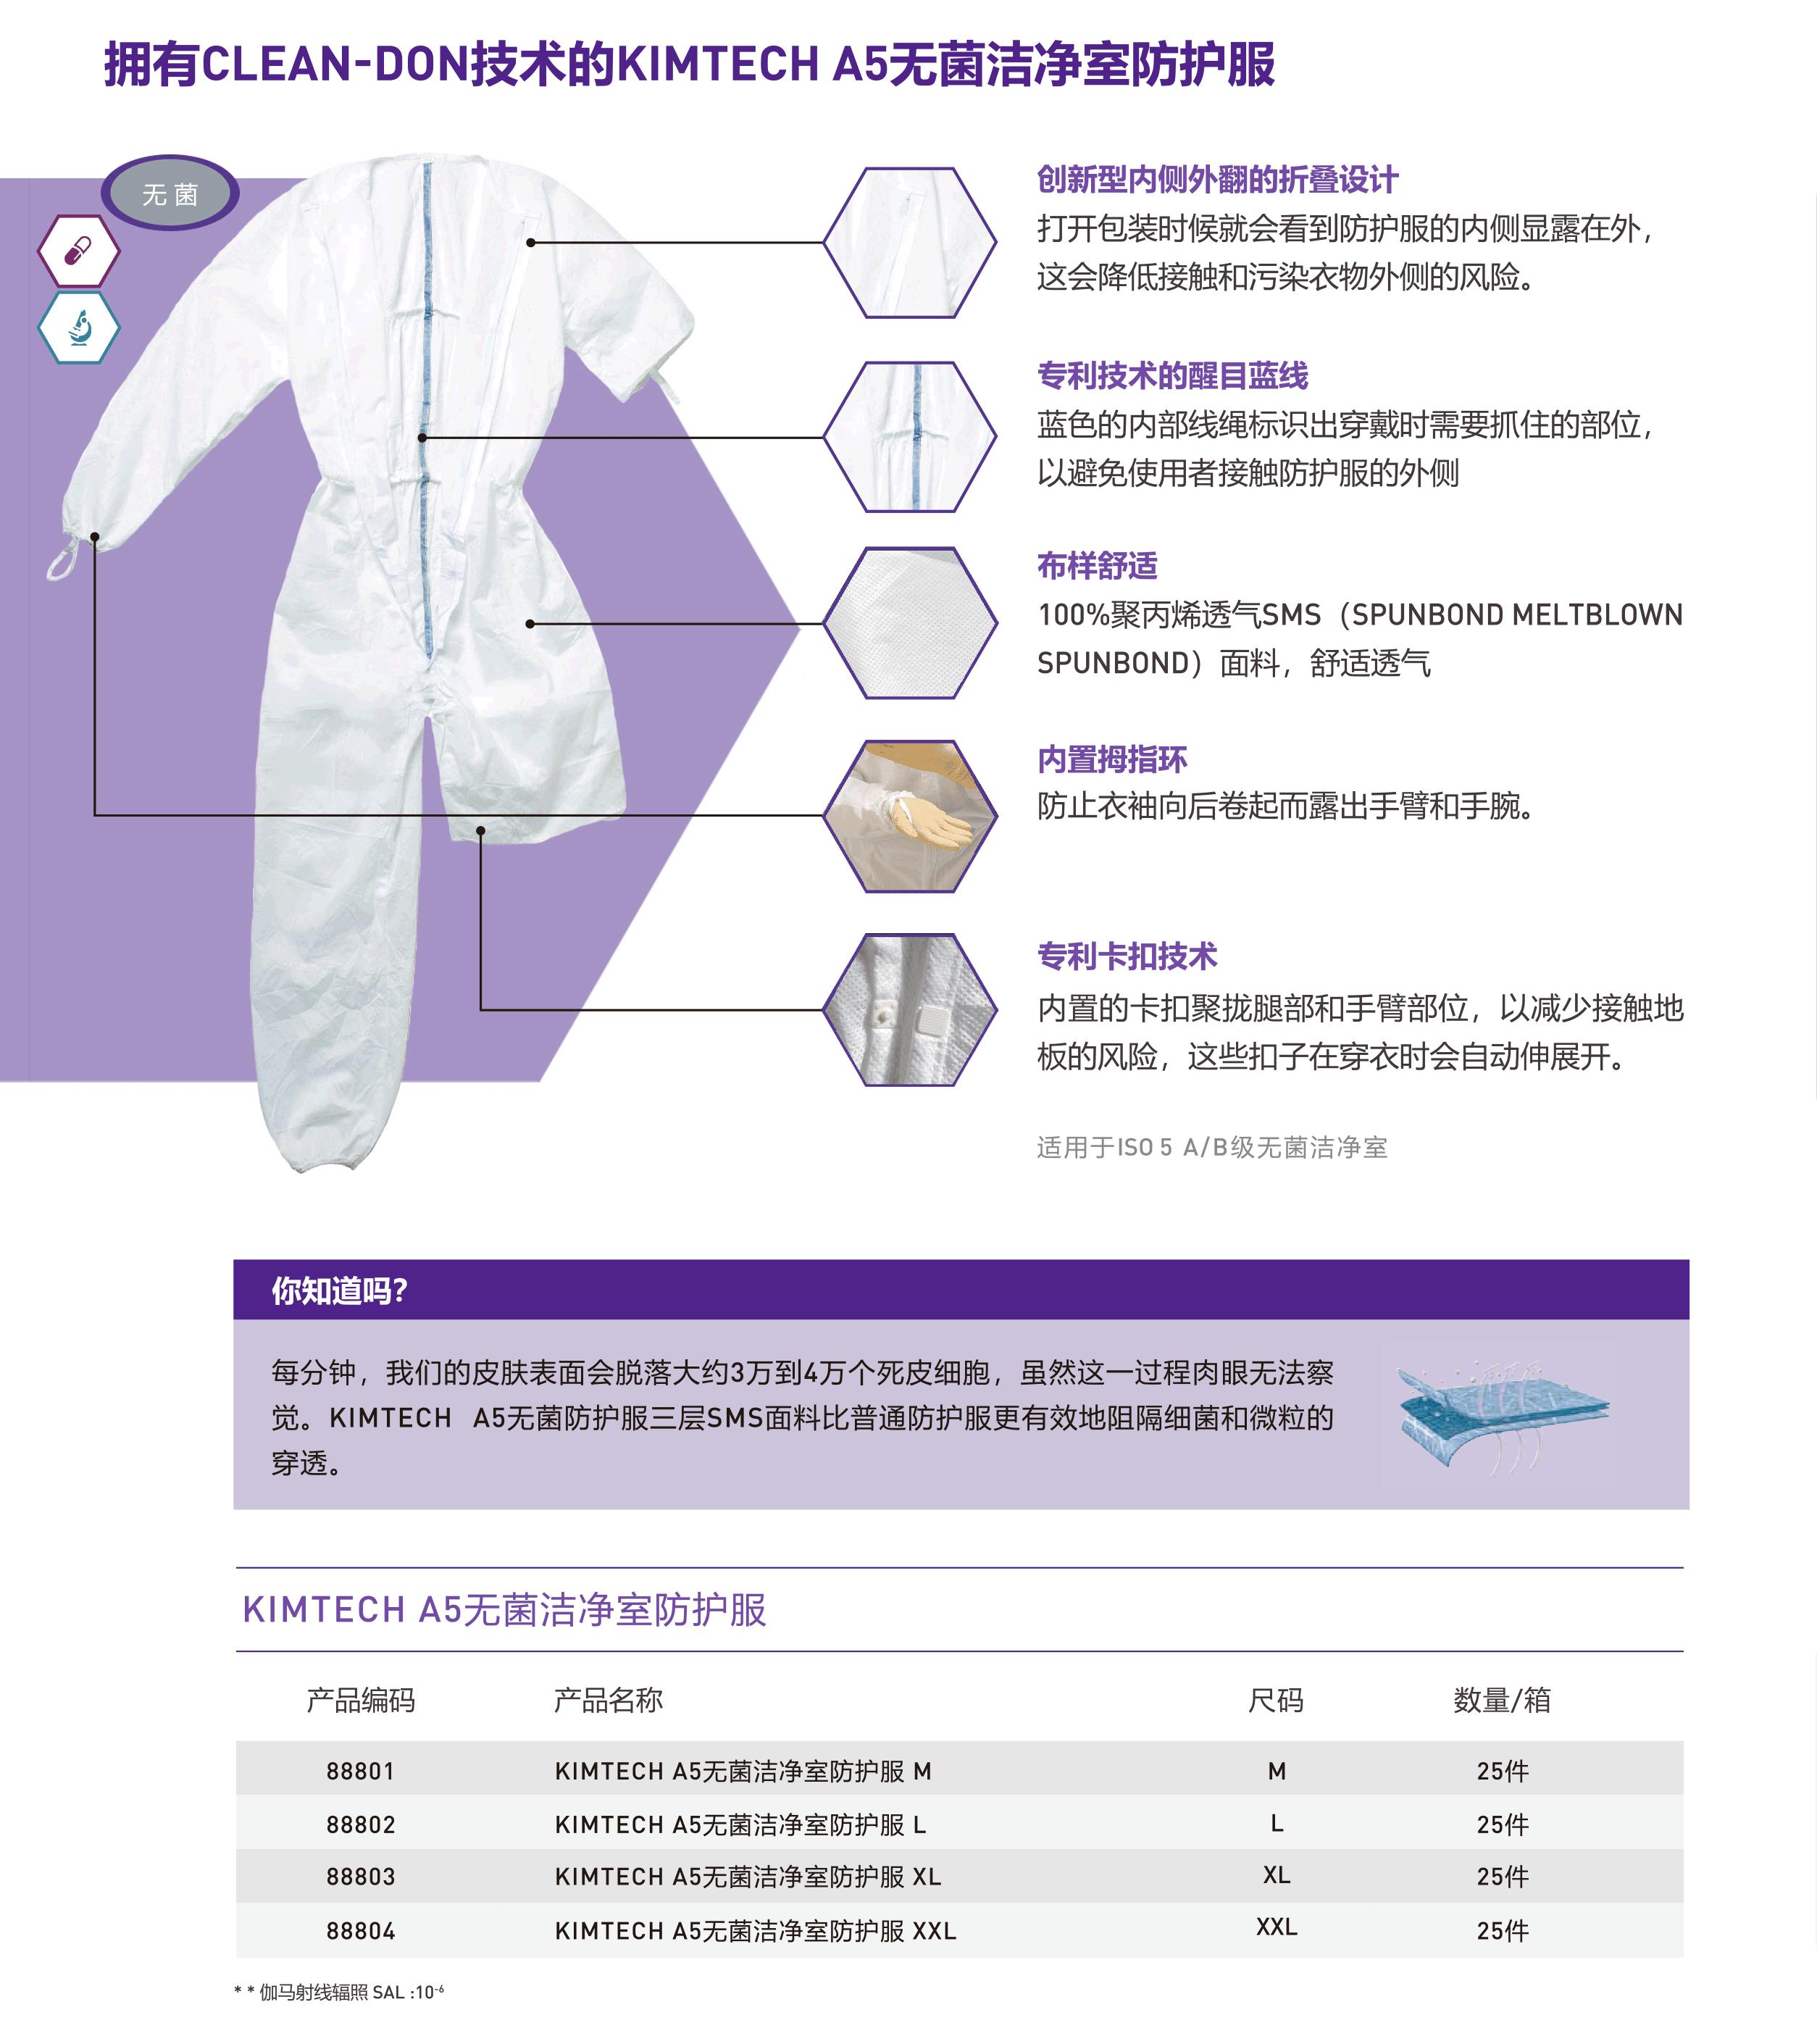 KIMTECH A5无菌洁净室防护服